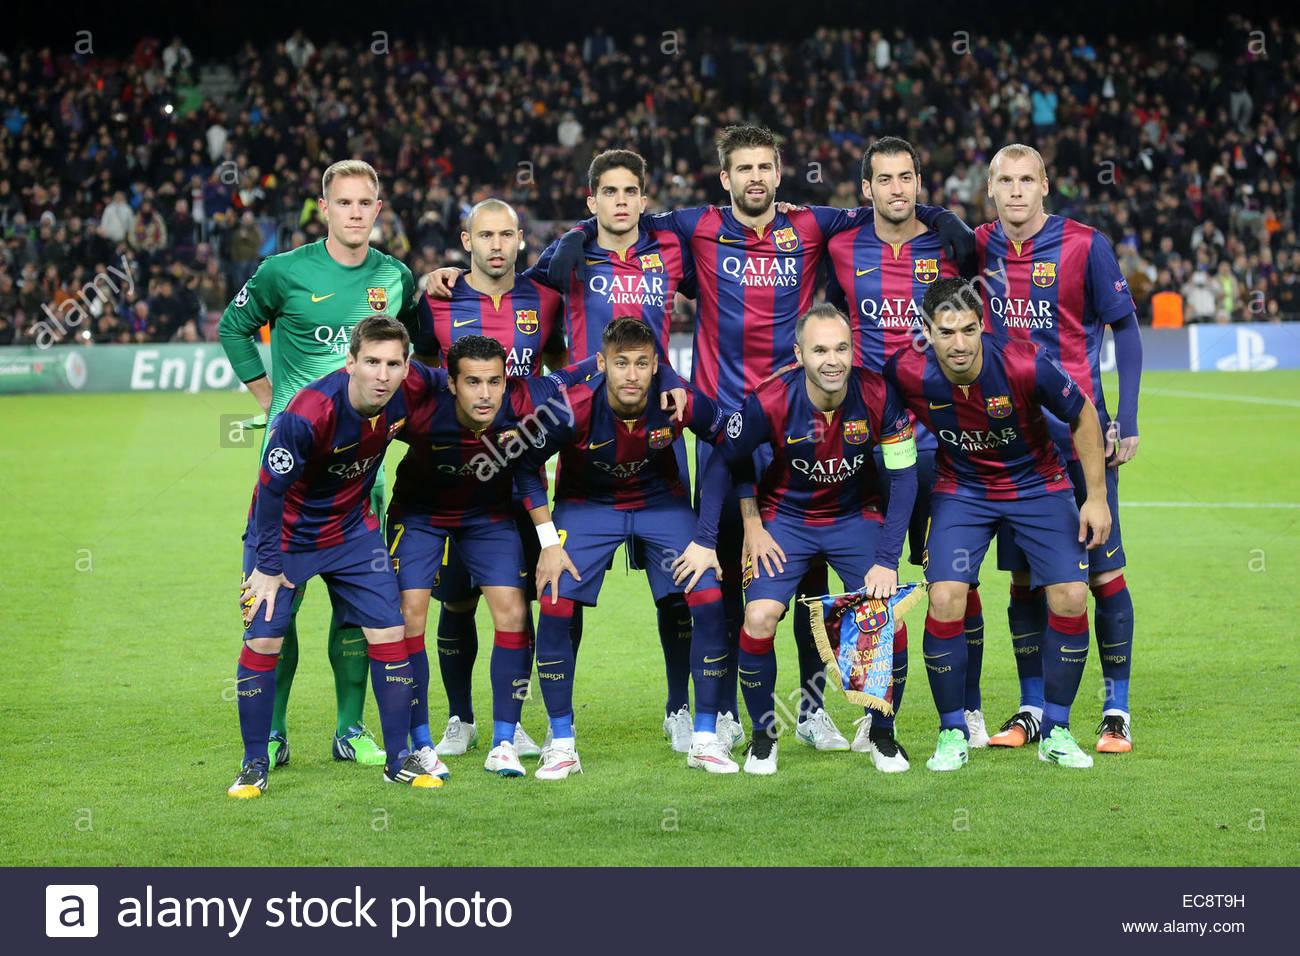 fc barcelona team promotion - photo #13